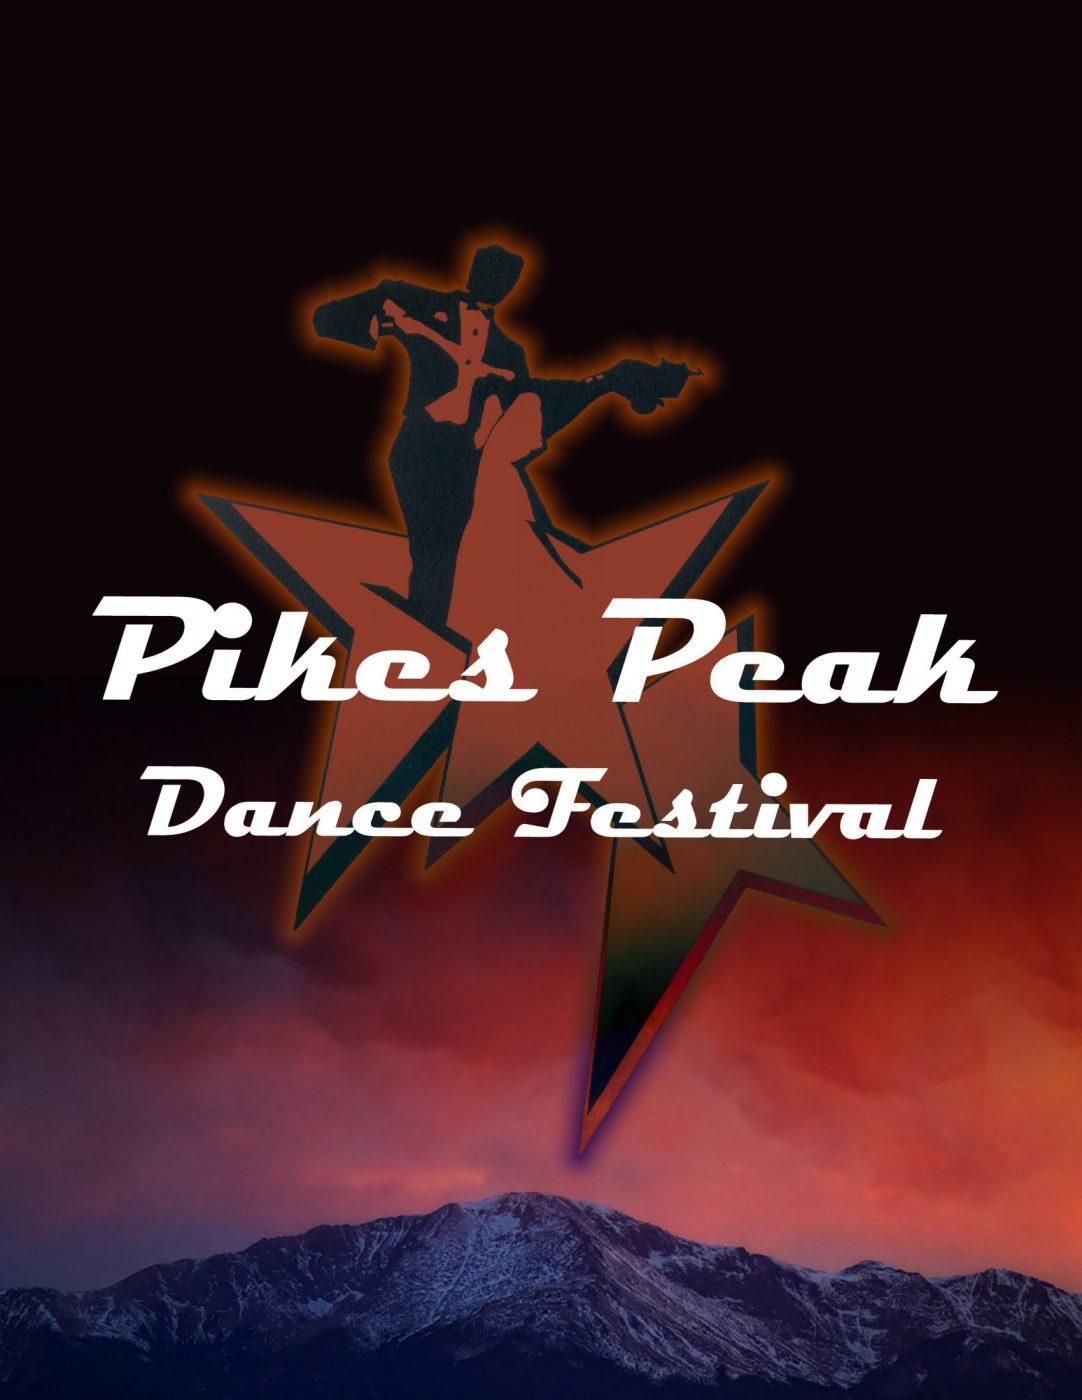 Pikes Peak Dance Festival LOGO 8.5X11